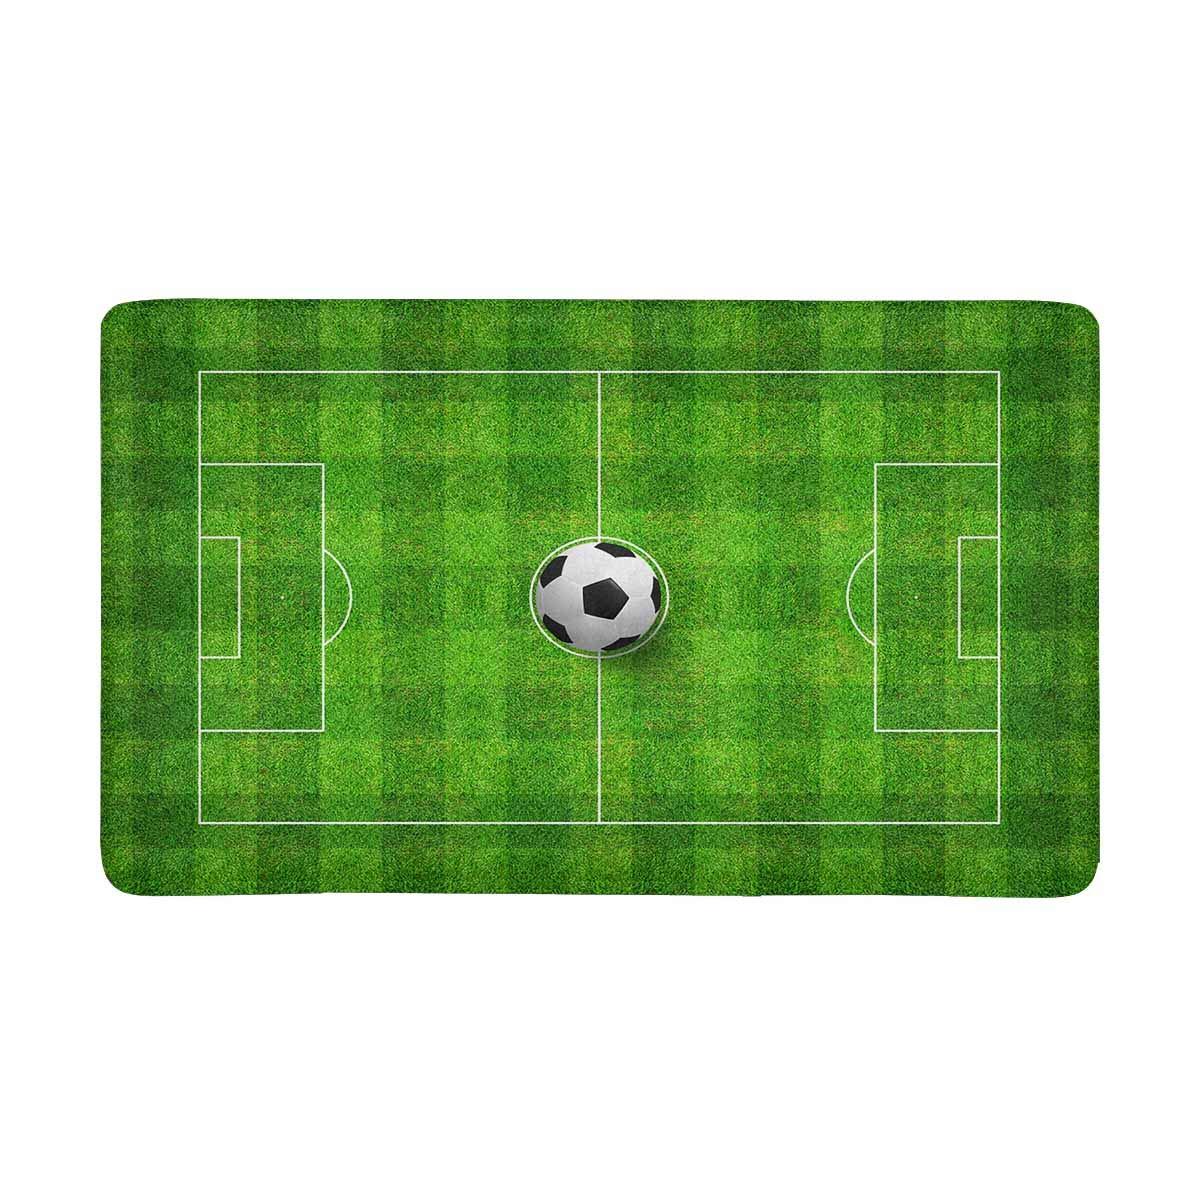 InterestPrint Top Views of Soccer Ball on Green Grass of Soccer Field Doormat Non-Slip Indoor and Outdoor Door Mat Rug Home Decor, Entrance Rug Floor Mats Rubber Backing, X-Large 30''(L) x 18''(W)